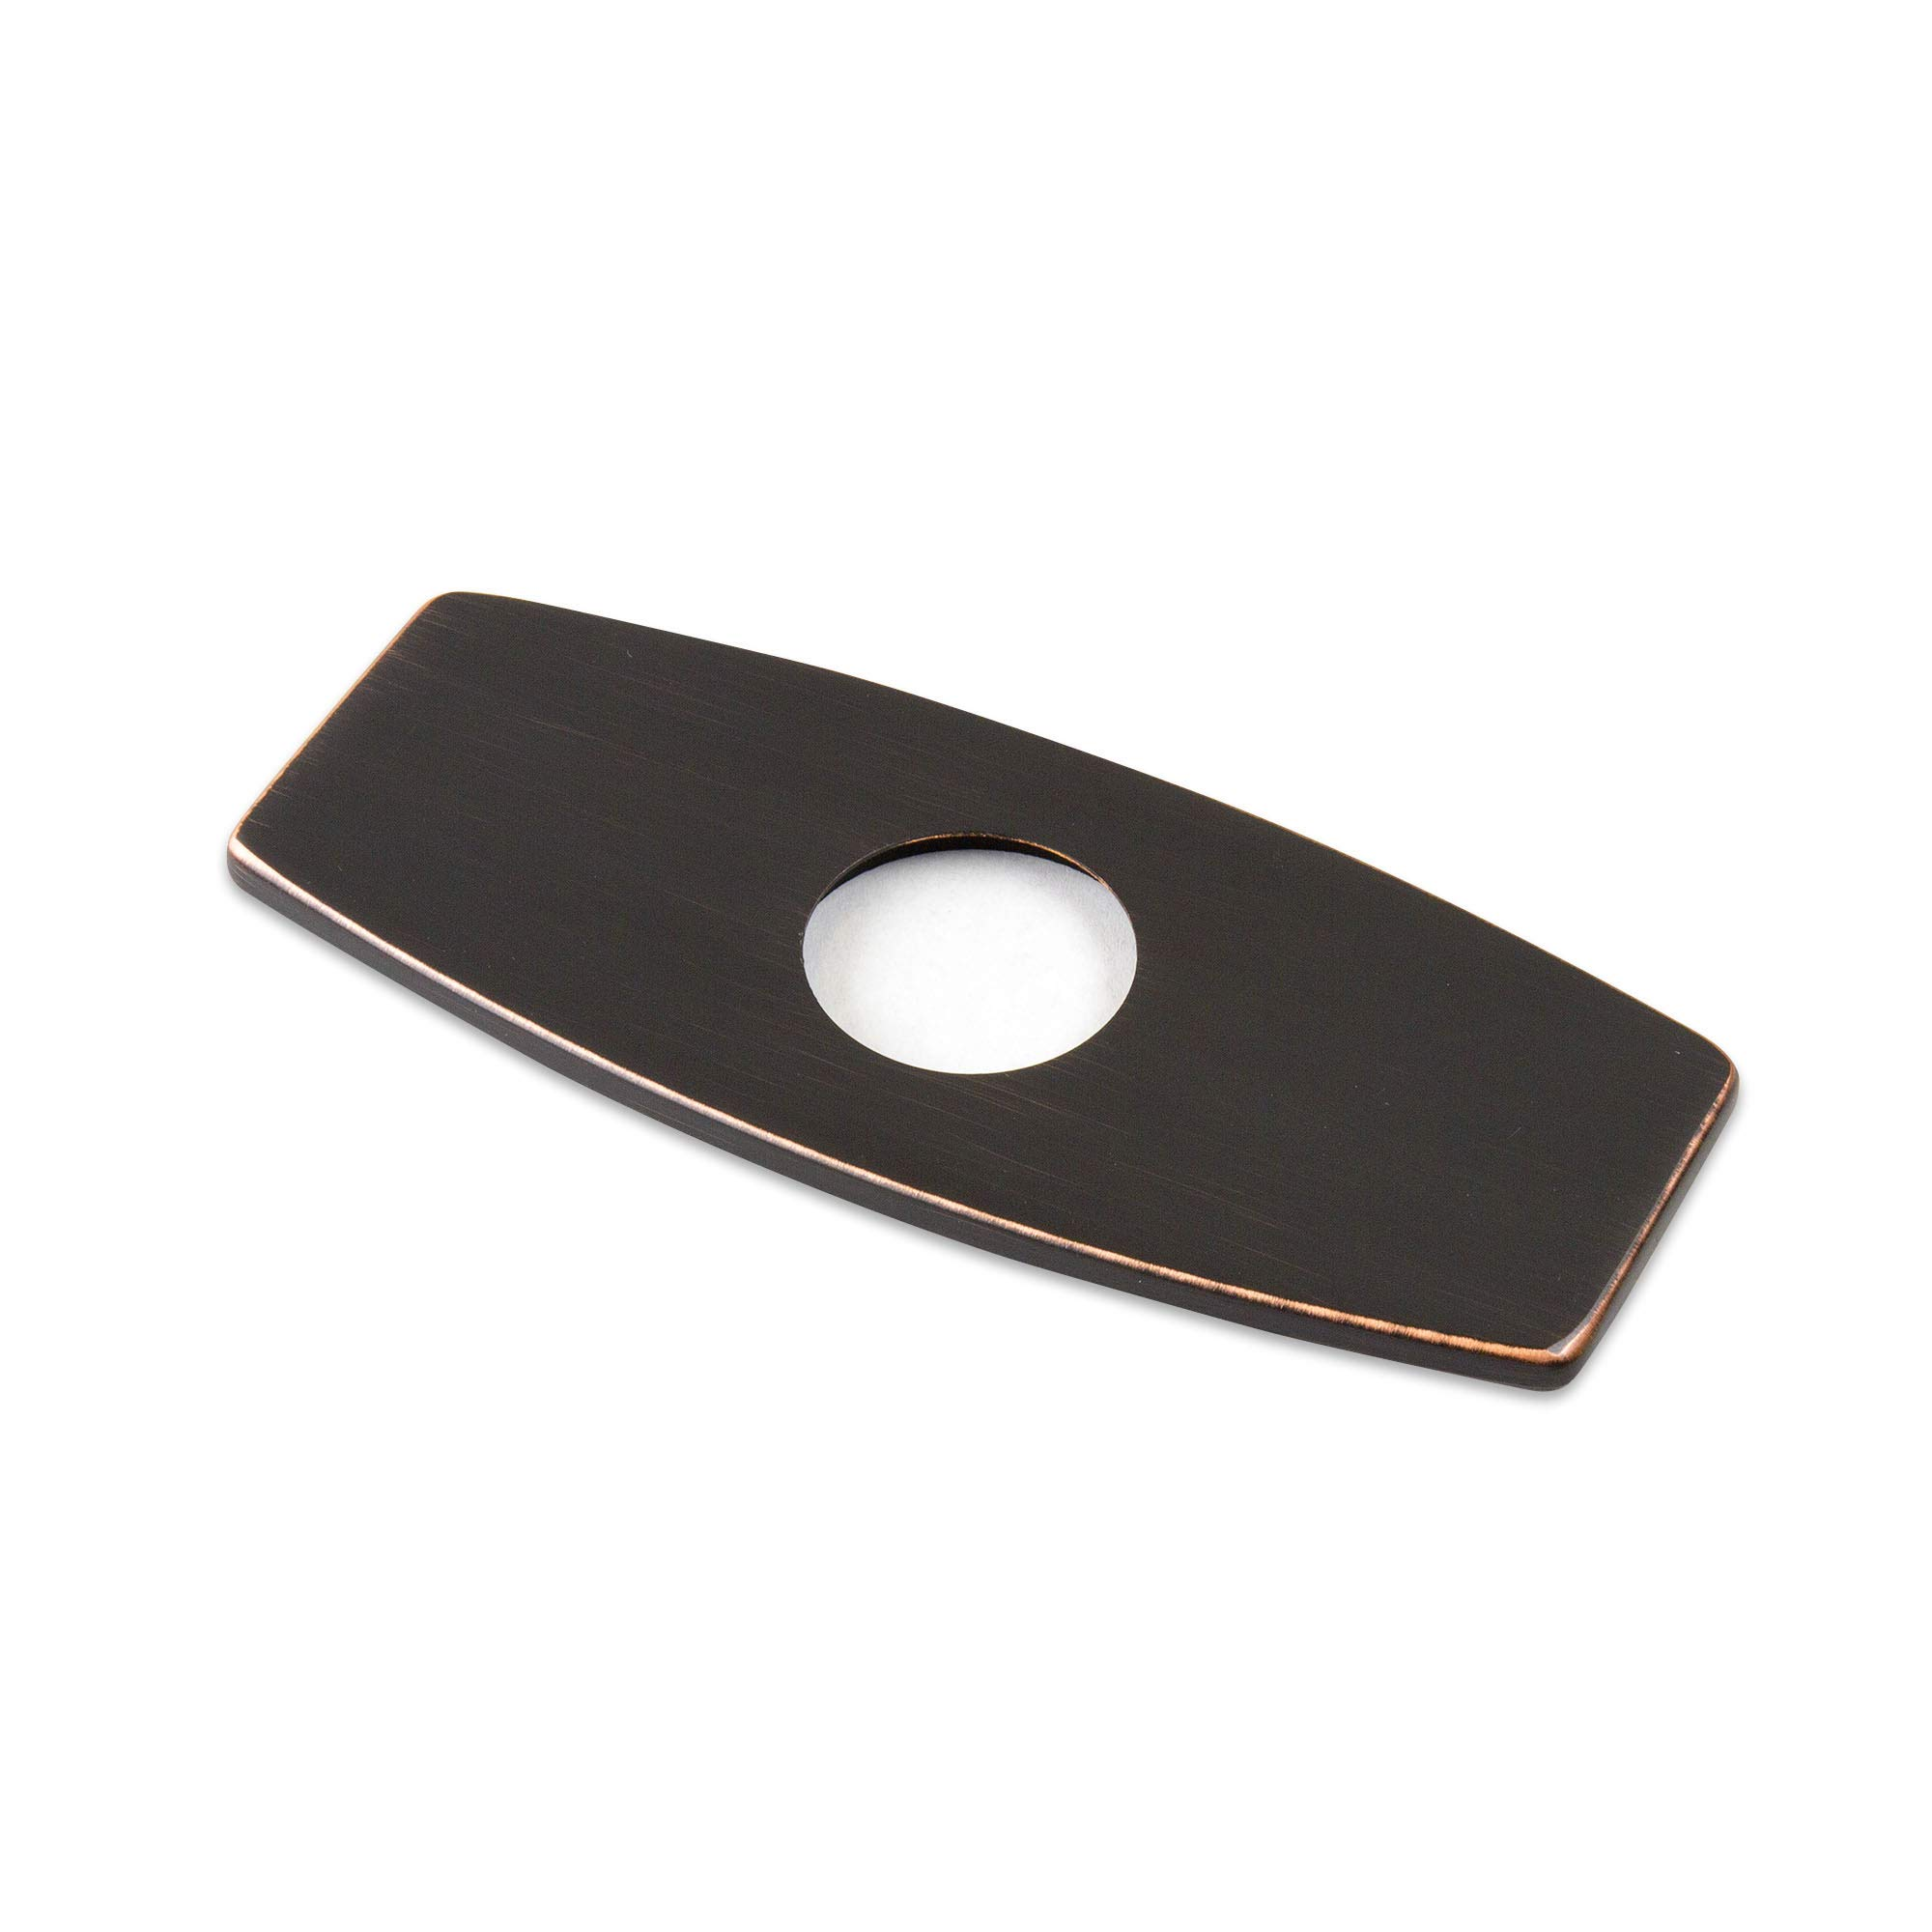 Decor Star PLATE-6O Bathroom Vessel Vanity Sink Faucet 6'' Hole Cover Deck Plate Escutcheon Oil Rubbed BronzE